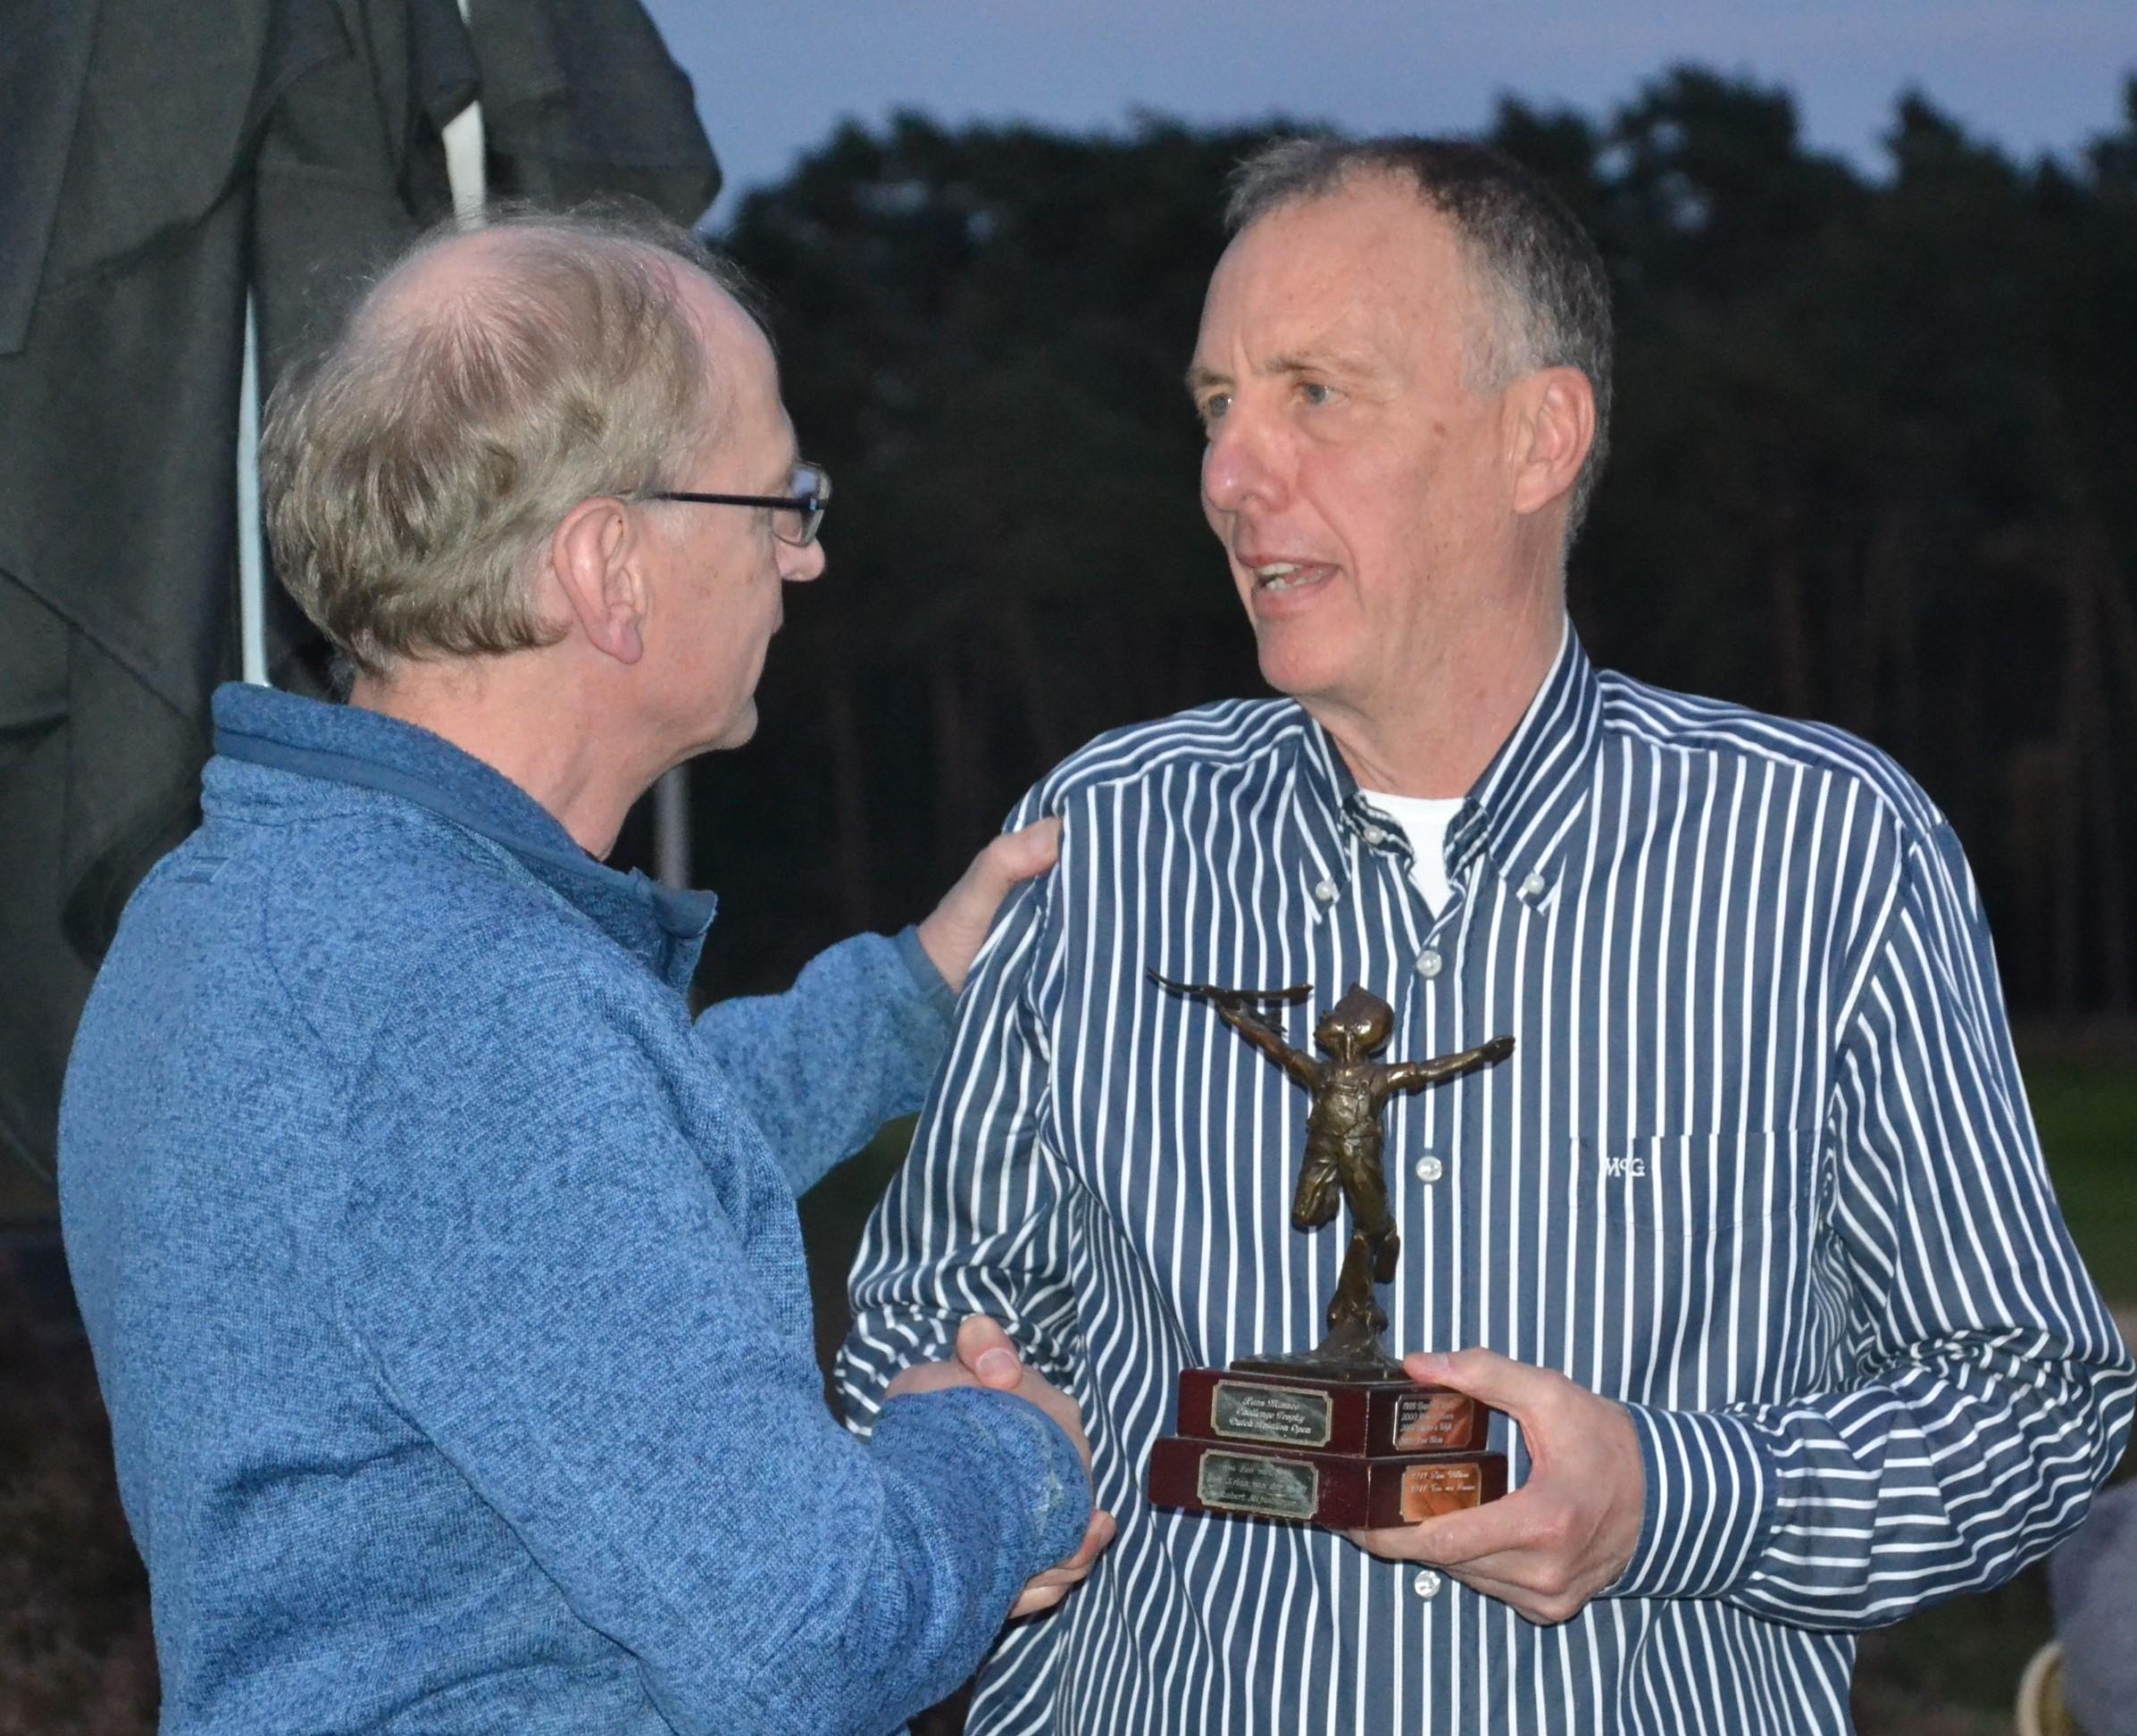 Ron van der Meulen wins 2019 edition